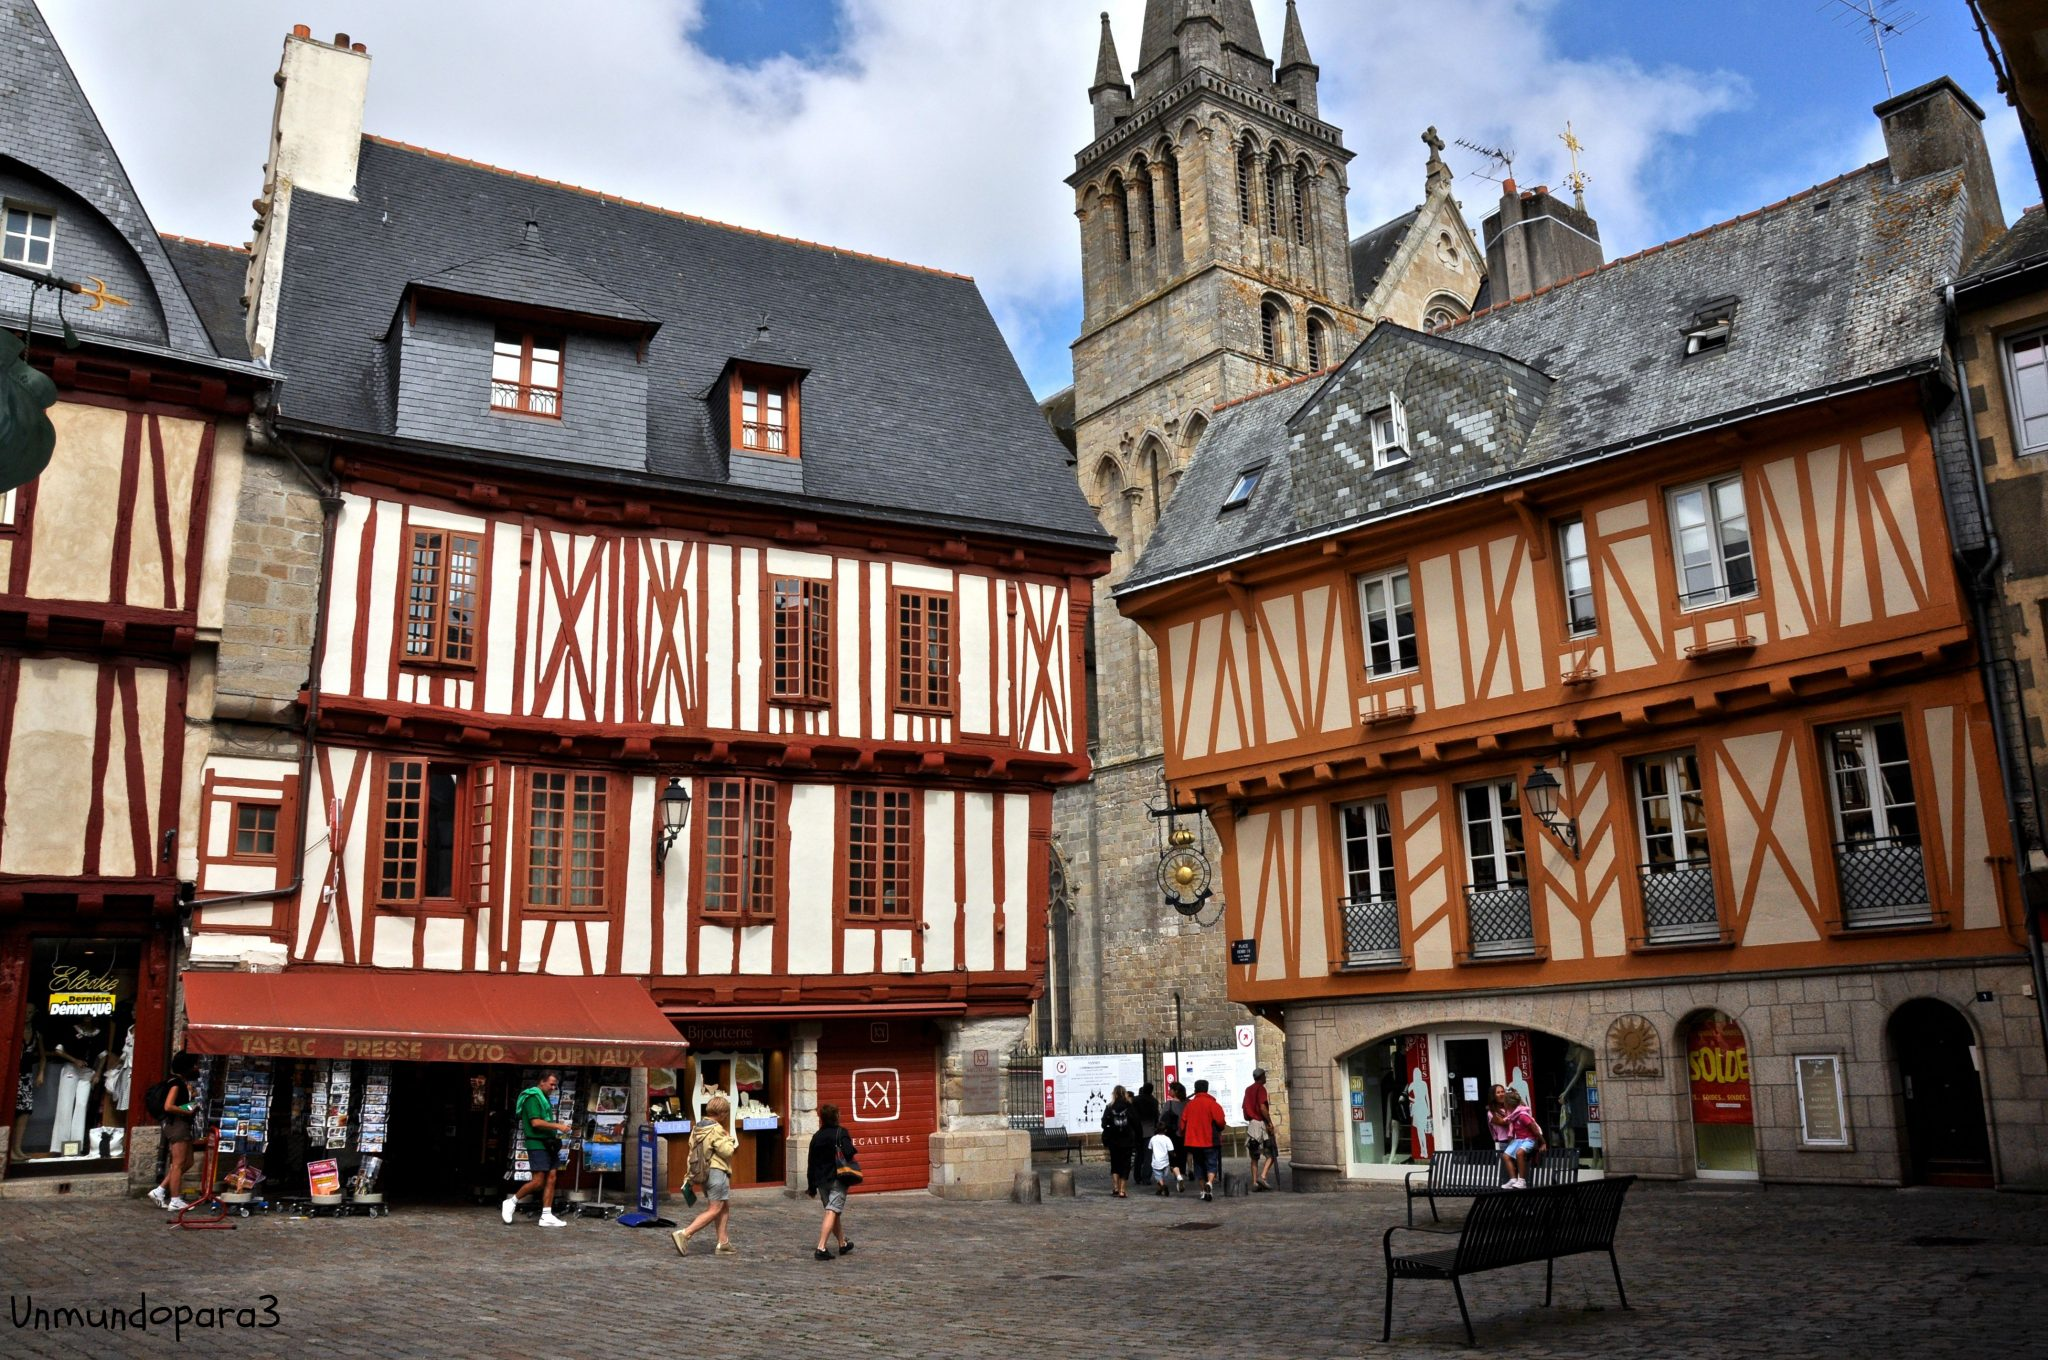 Ruta por la breta a francesa un mundo para 3 for Maison de la literie vannes